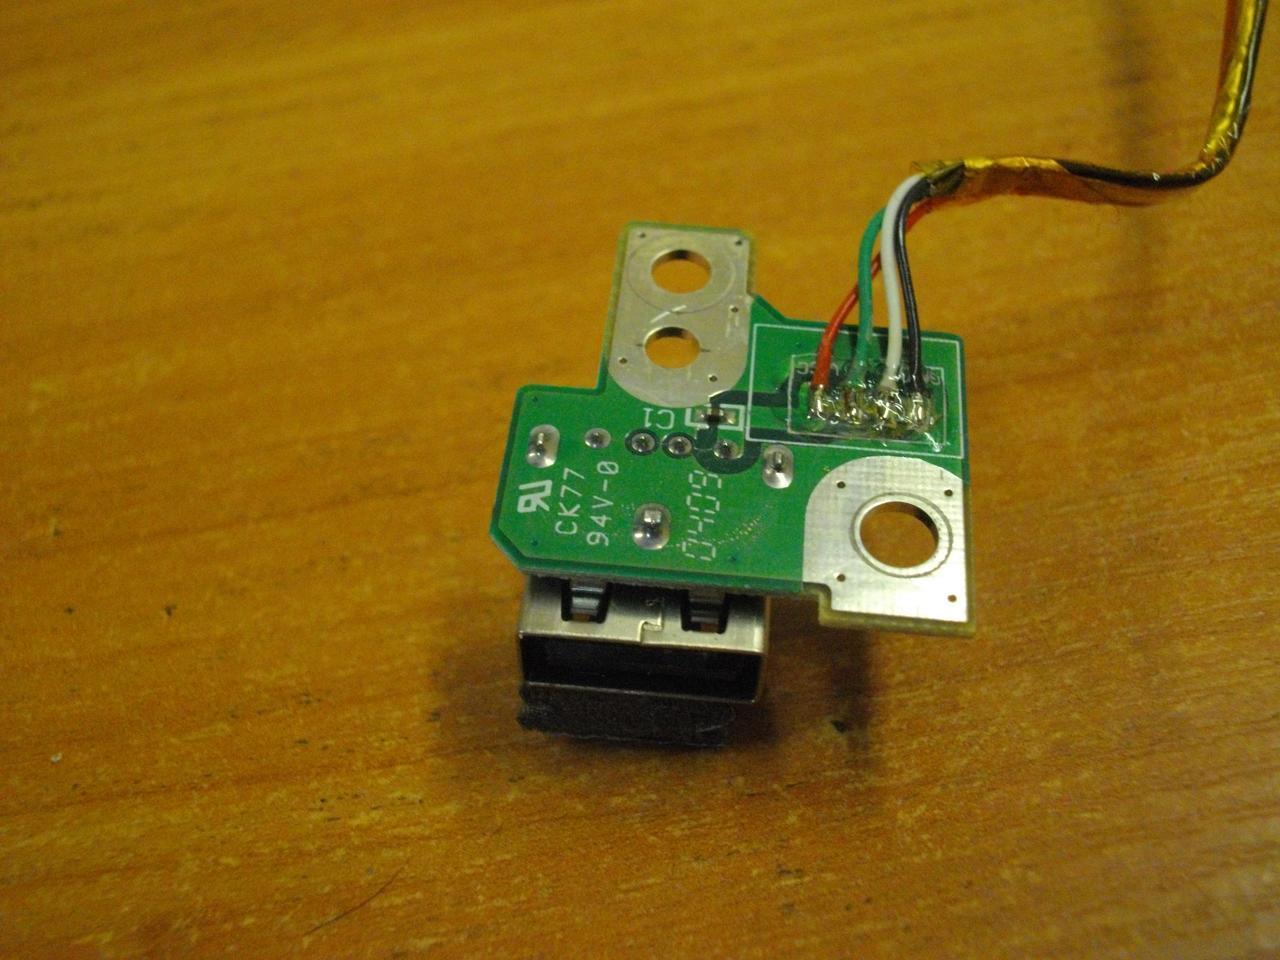 Плата 01-01000197-00 с USB разъемом портом гнездом Toshiba SPM30 PSM35E M30 M35 PSM35E-000MN-RU бу